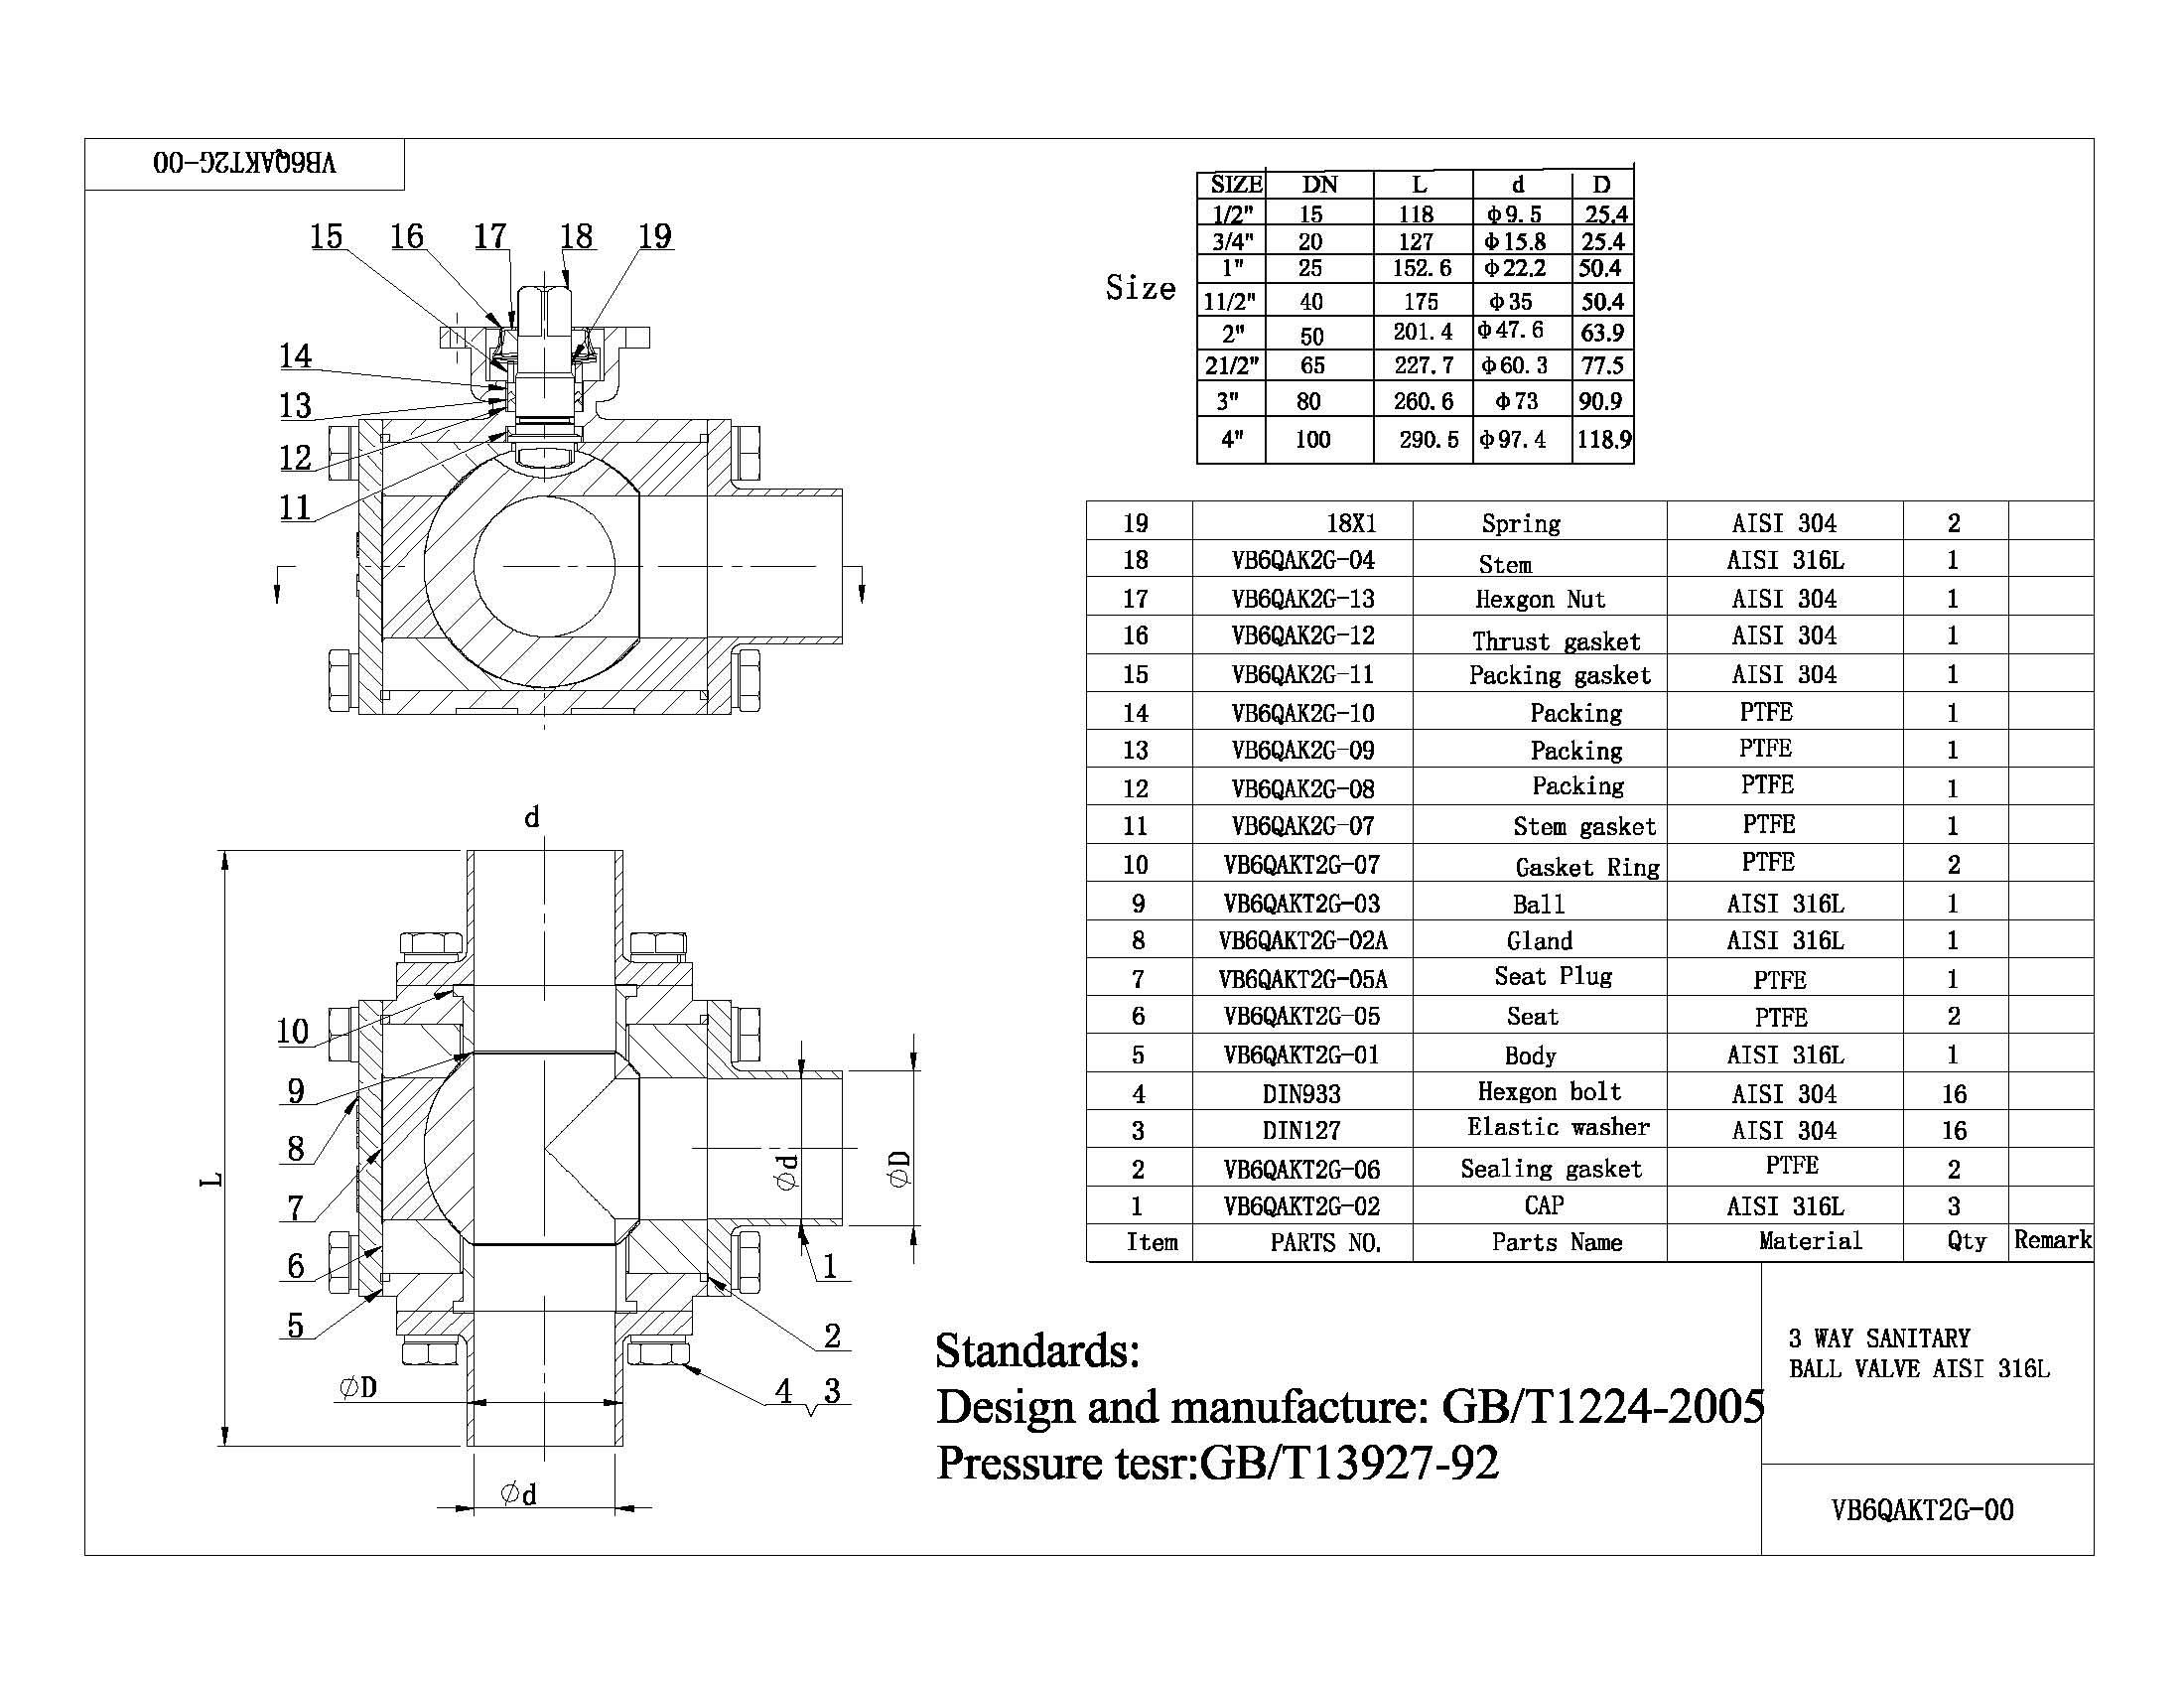 3 Way Sanitary Ball Valve Aisi 316l China Industrial